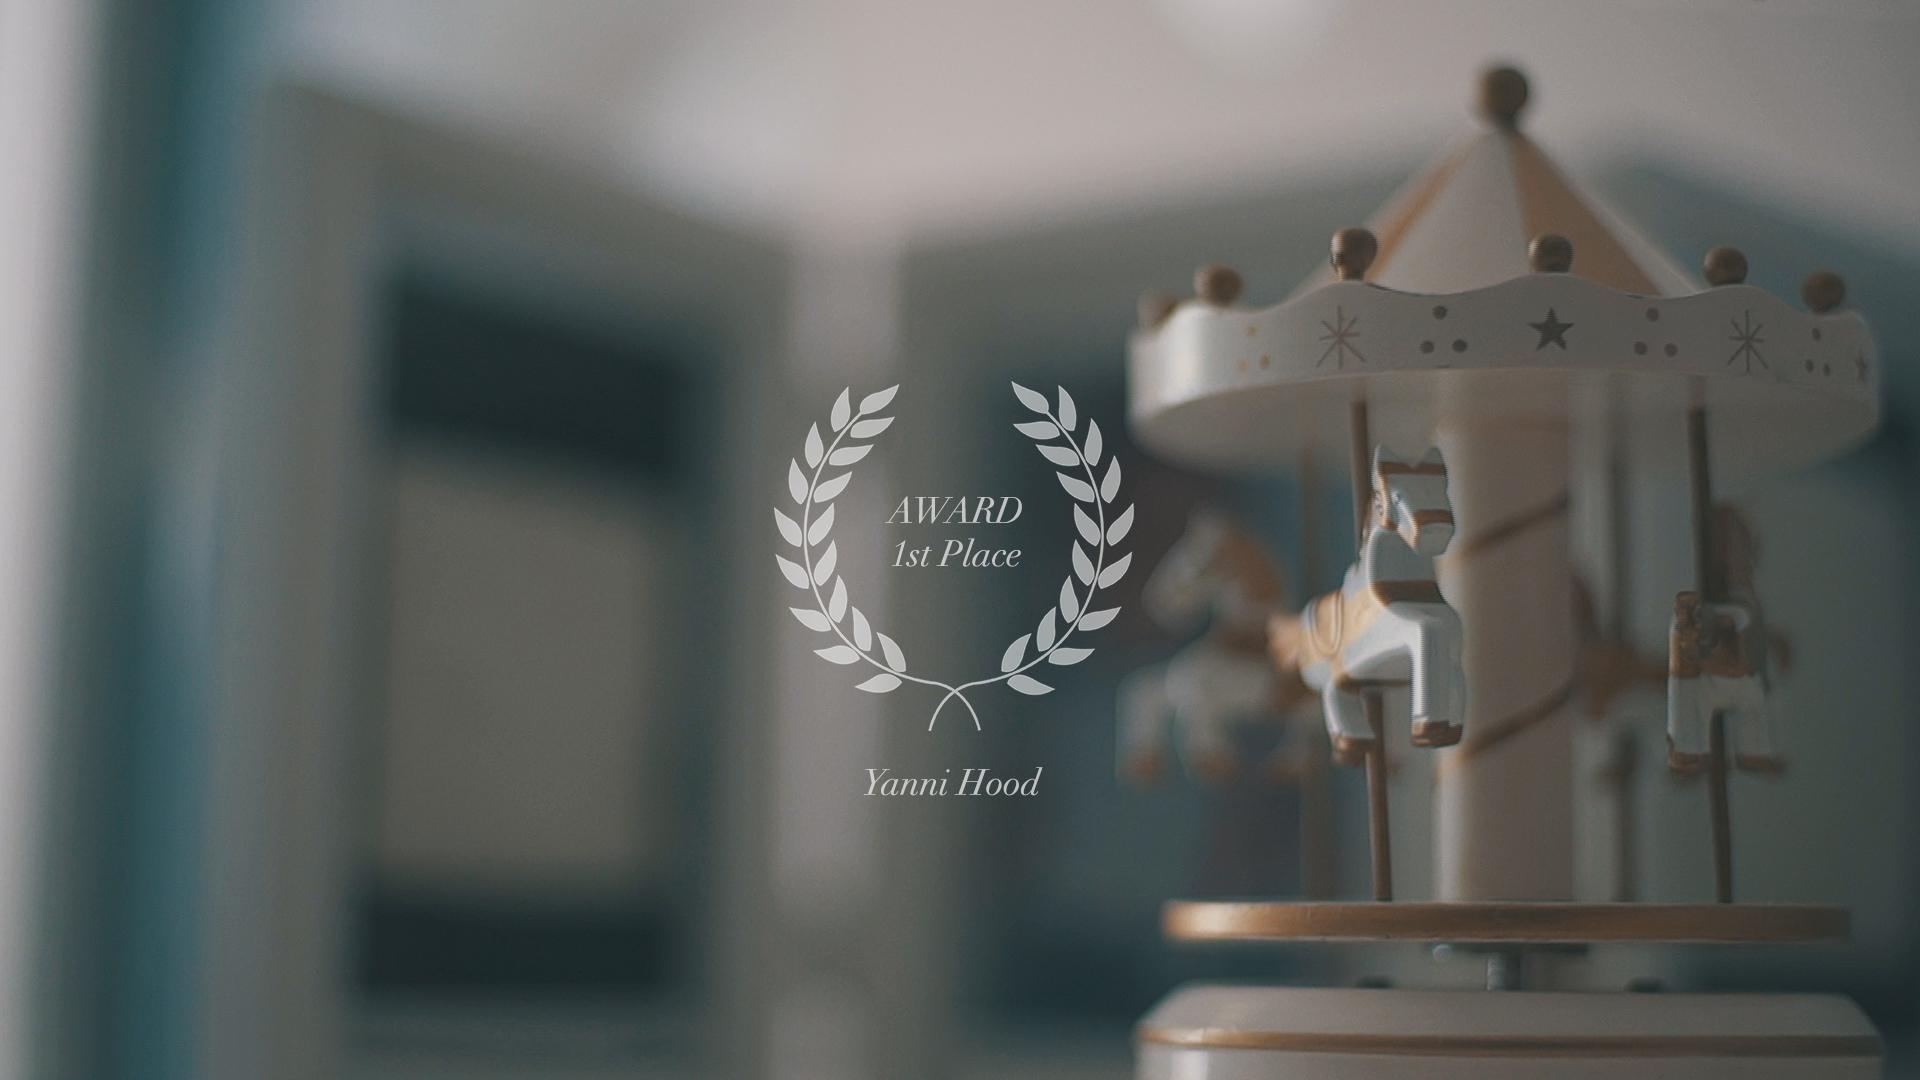 demetris award